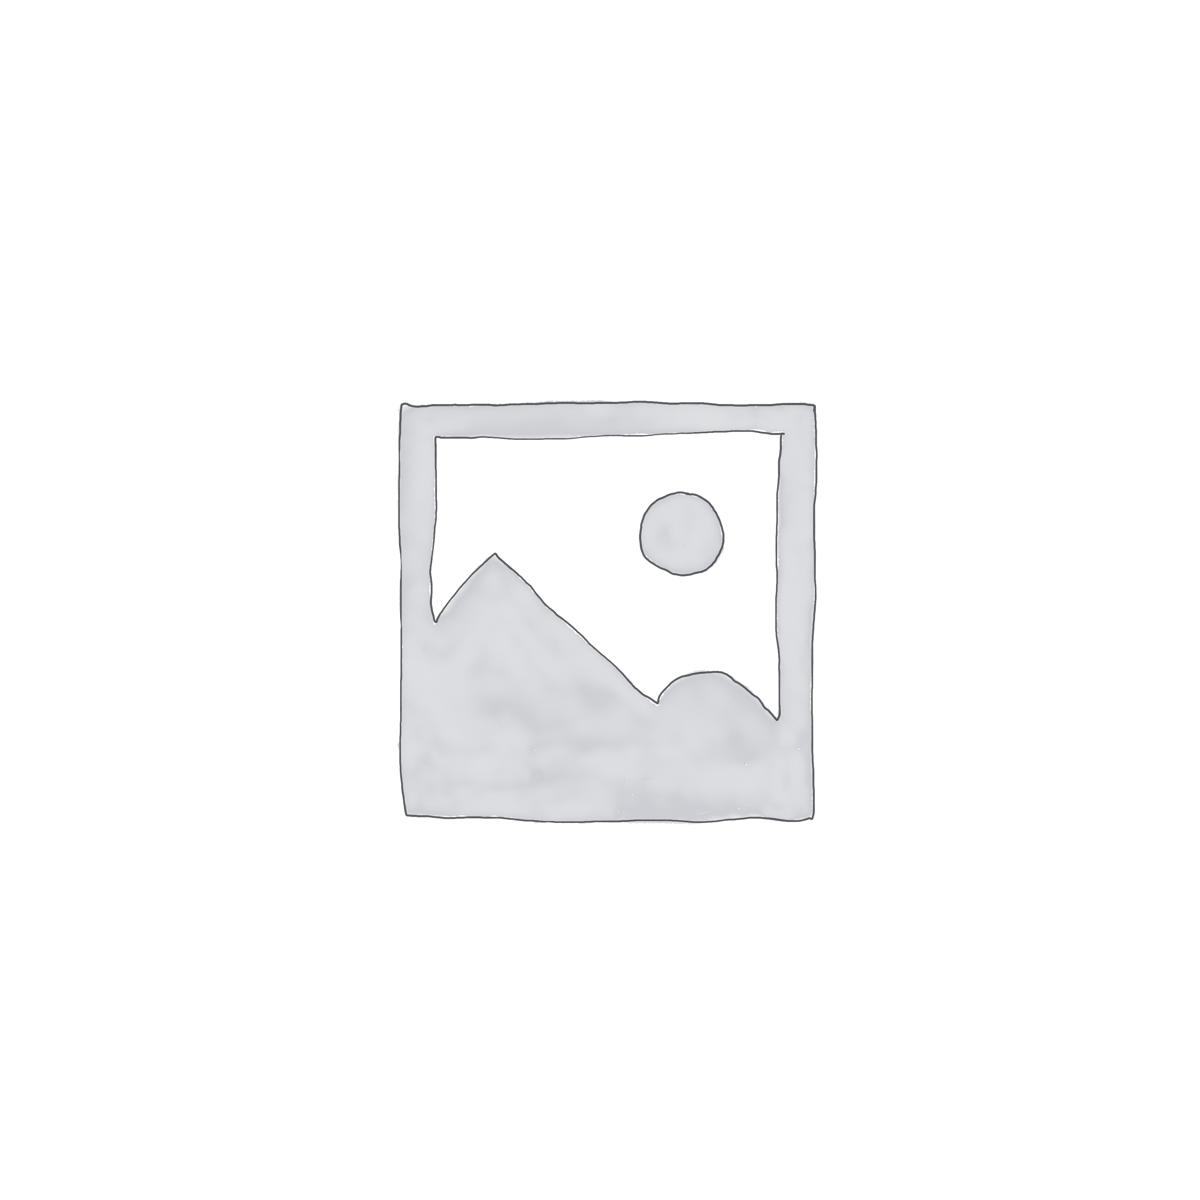 Green Leaf Pattern Wallpaper Mural